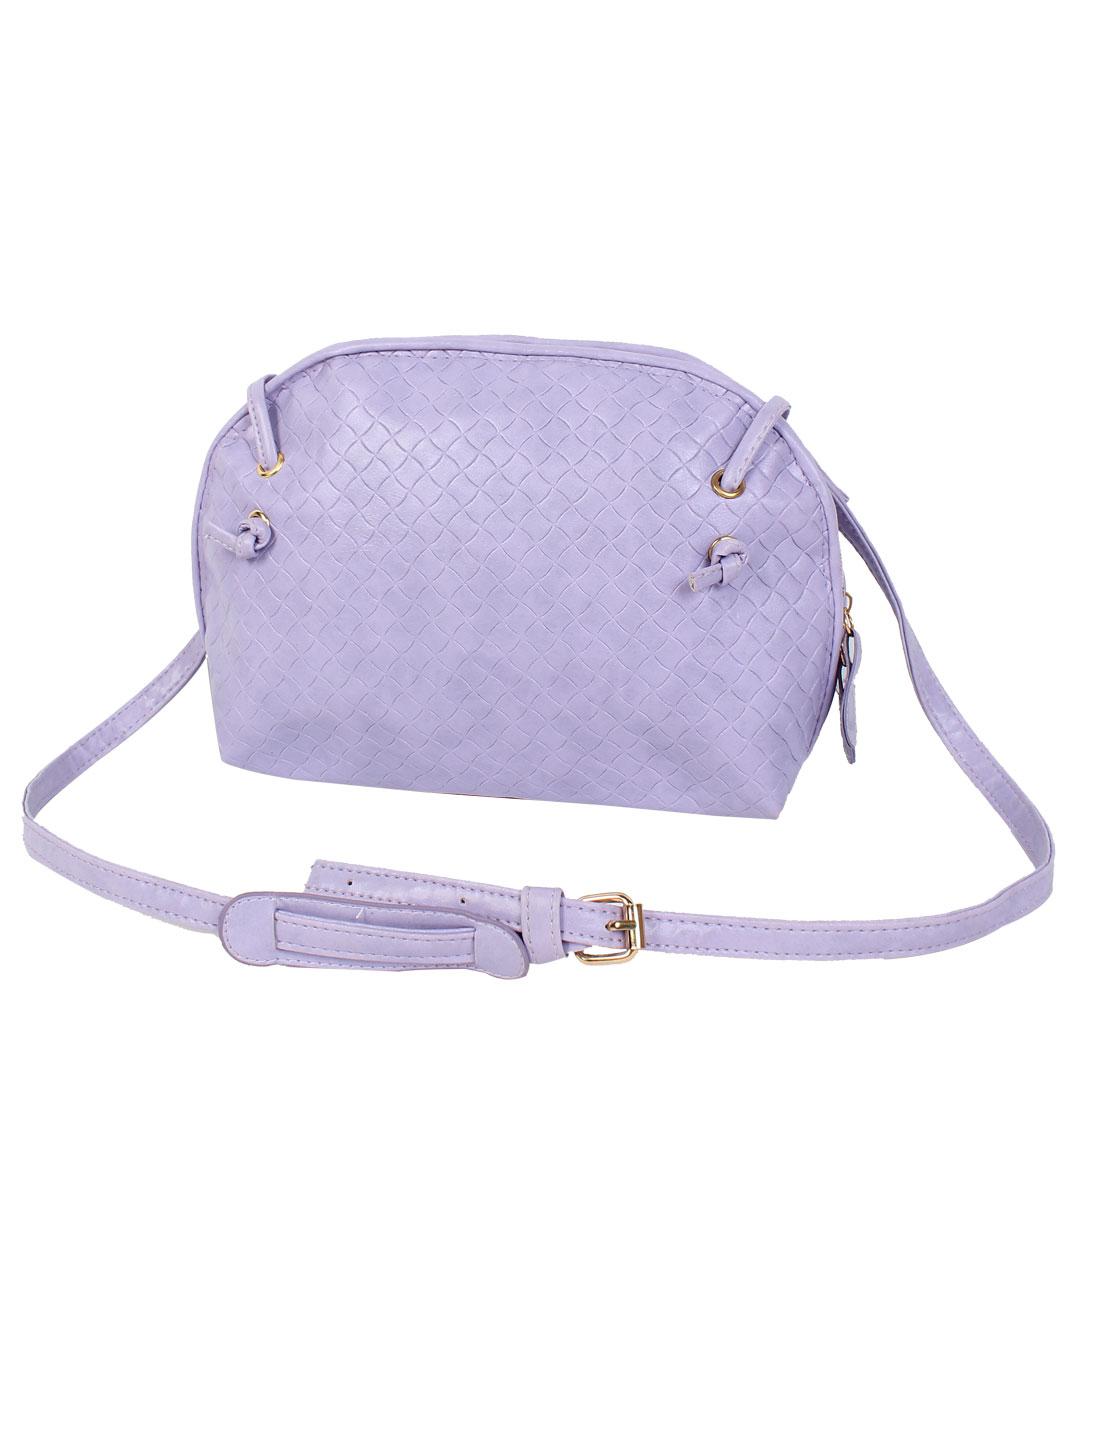 Women PU Tote Satchel Messenger Bag Casual Purse Cross Body Shoulder Handbag Purple